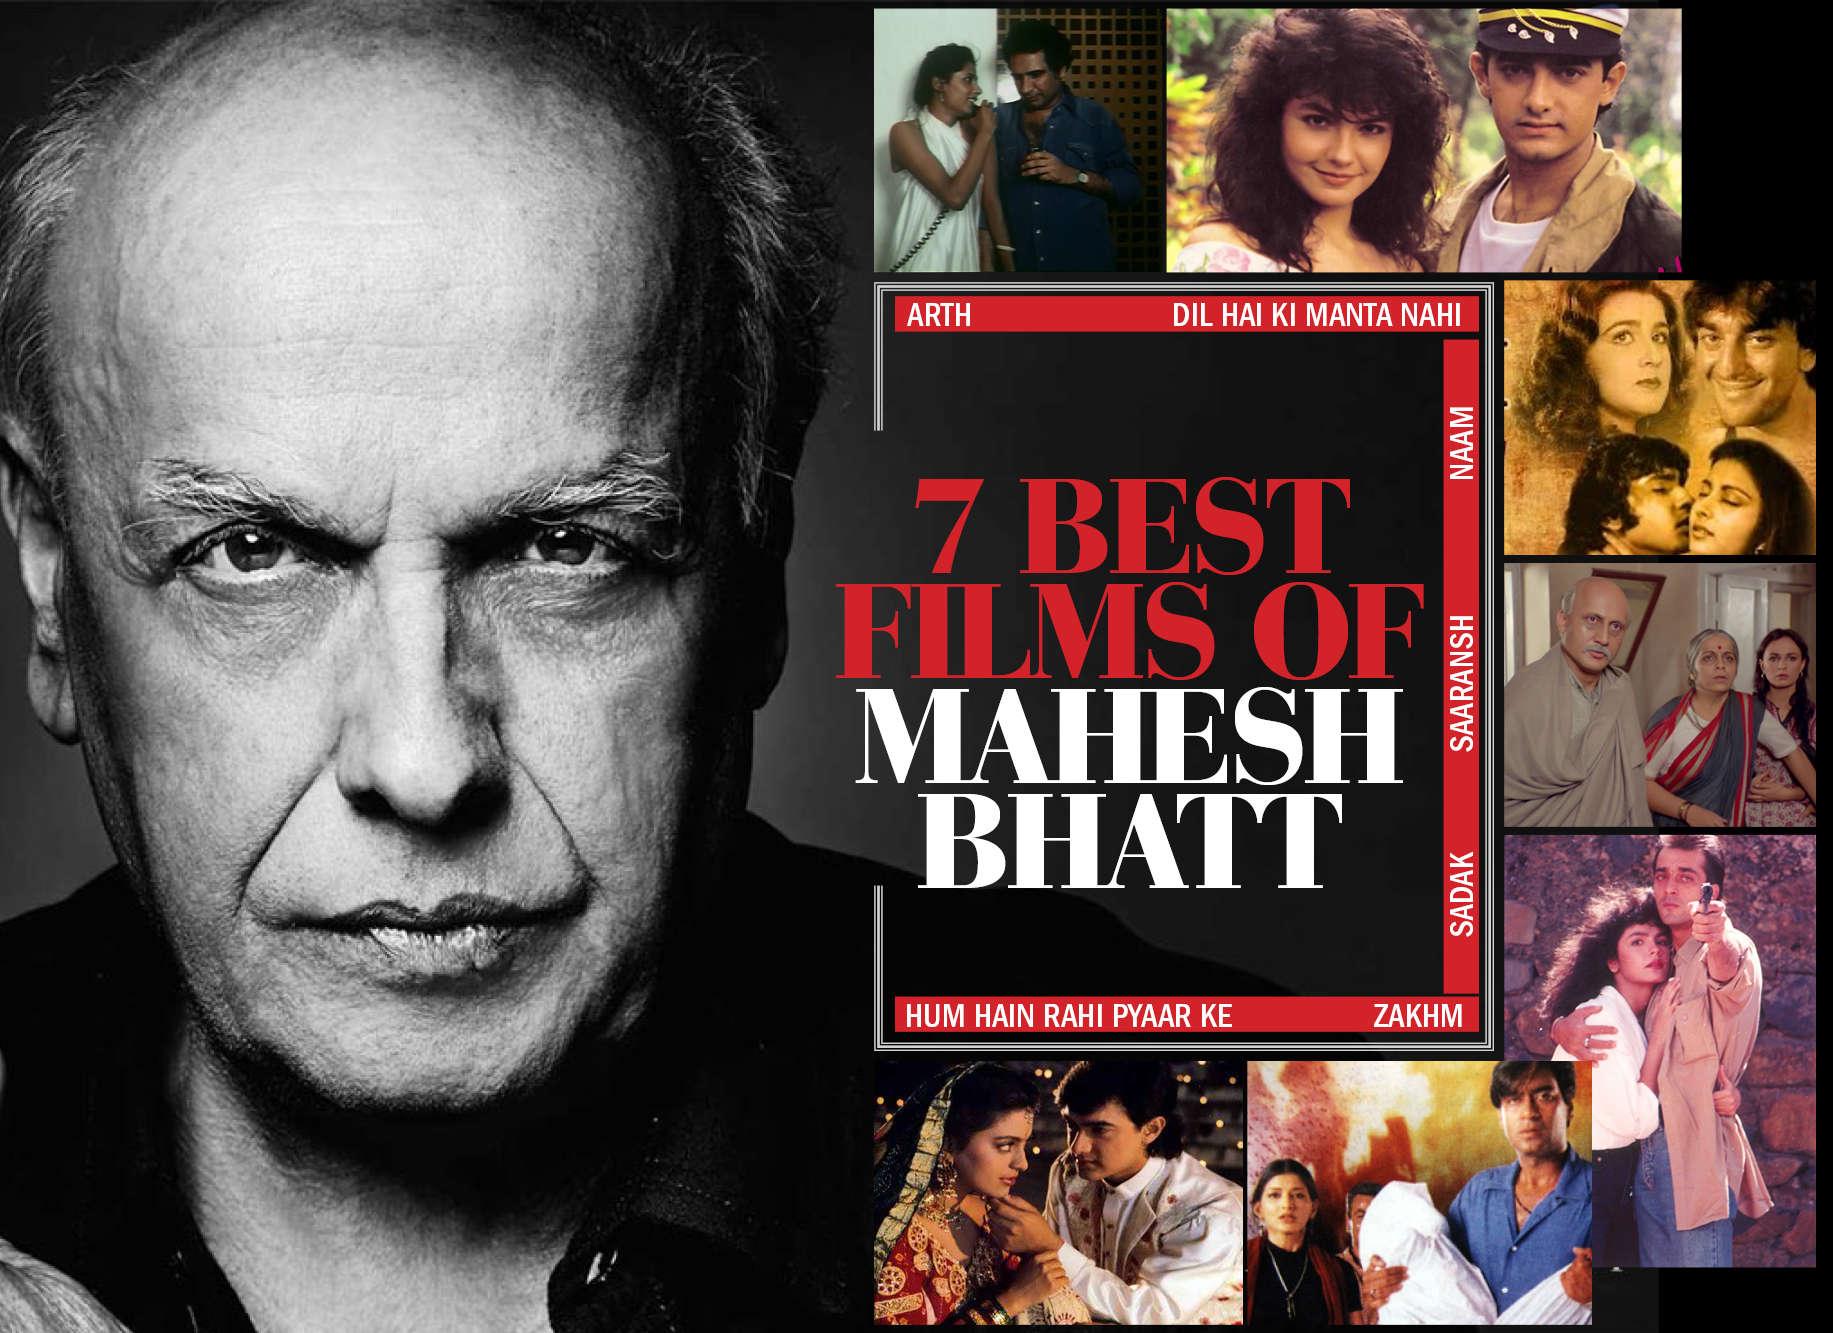 Mahesh Bhatt talks about his inspiration behind making Arth